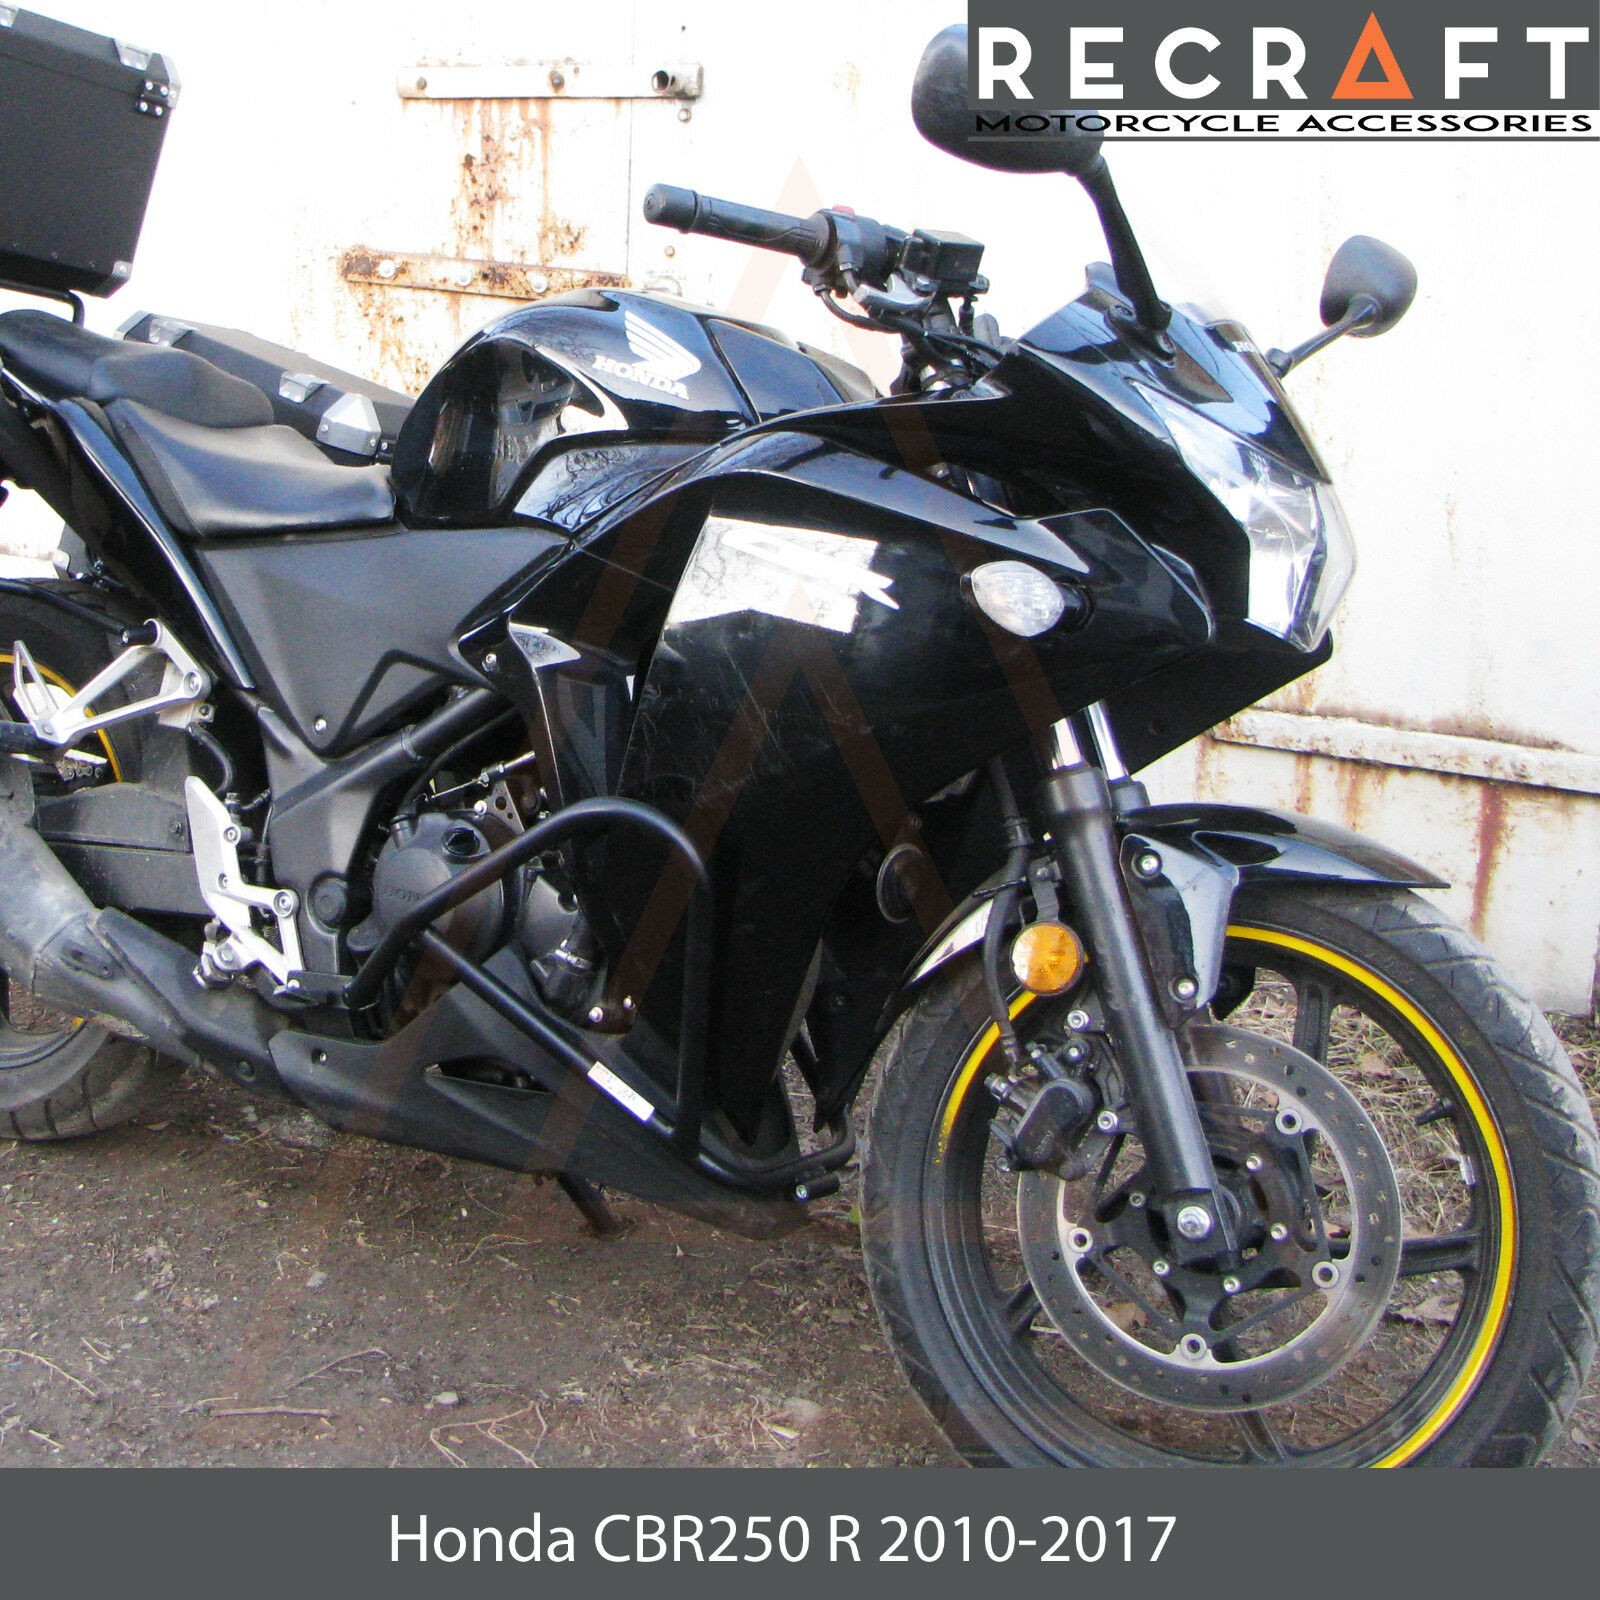 Recraft Honda CBR 250 R 2010-2017 Crash Bars Engine Guard Frame Protector